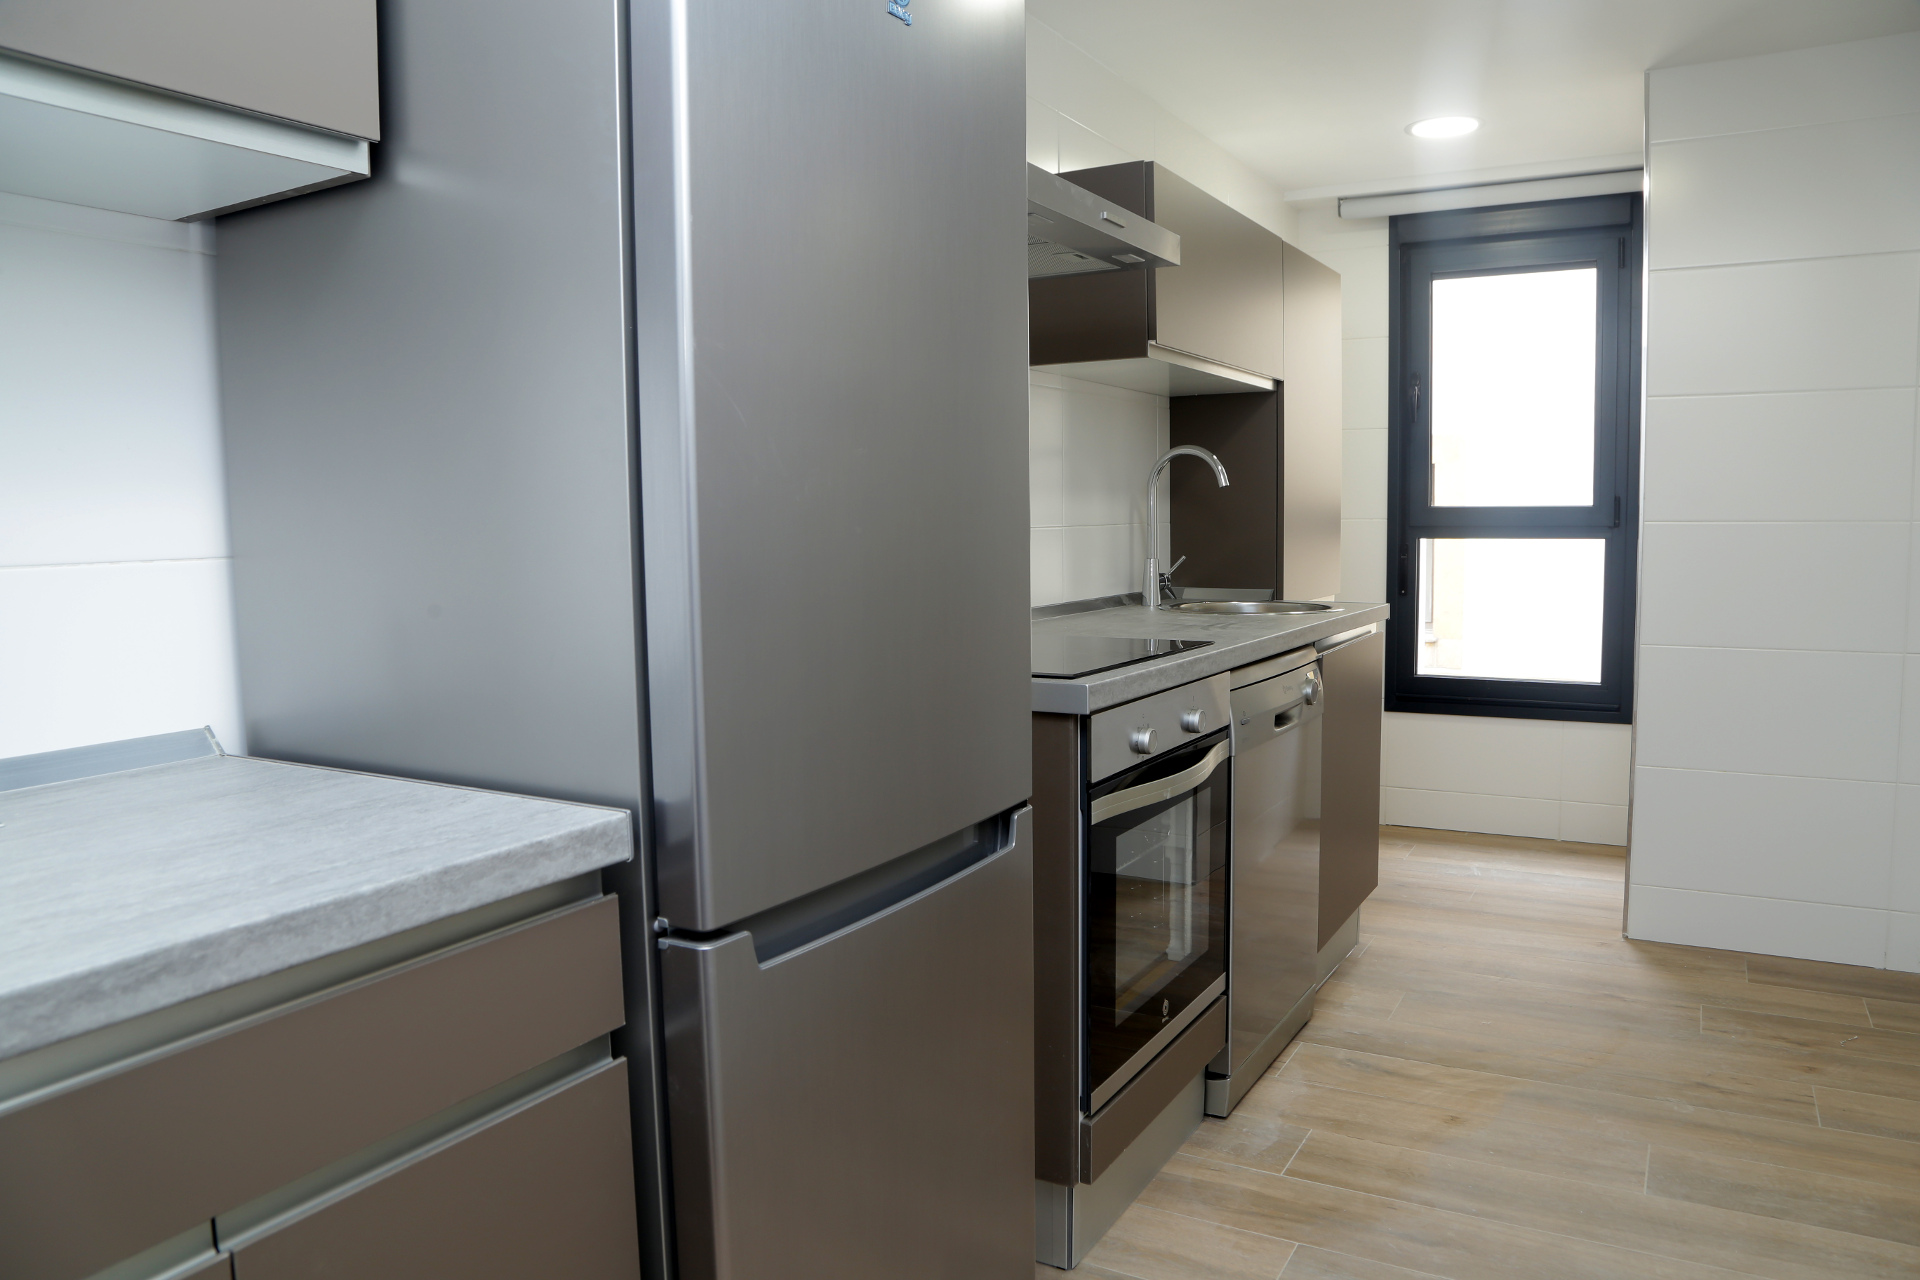 Apartamento_1A_Lastres_Oviedo_Catedral_cocina